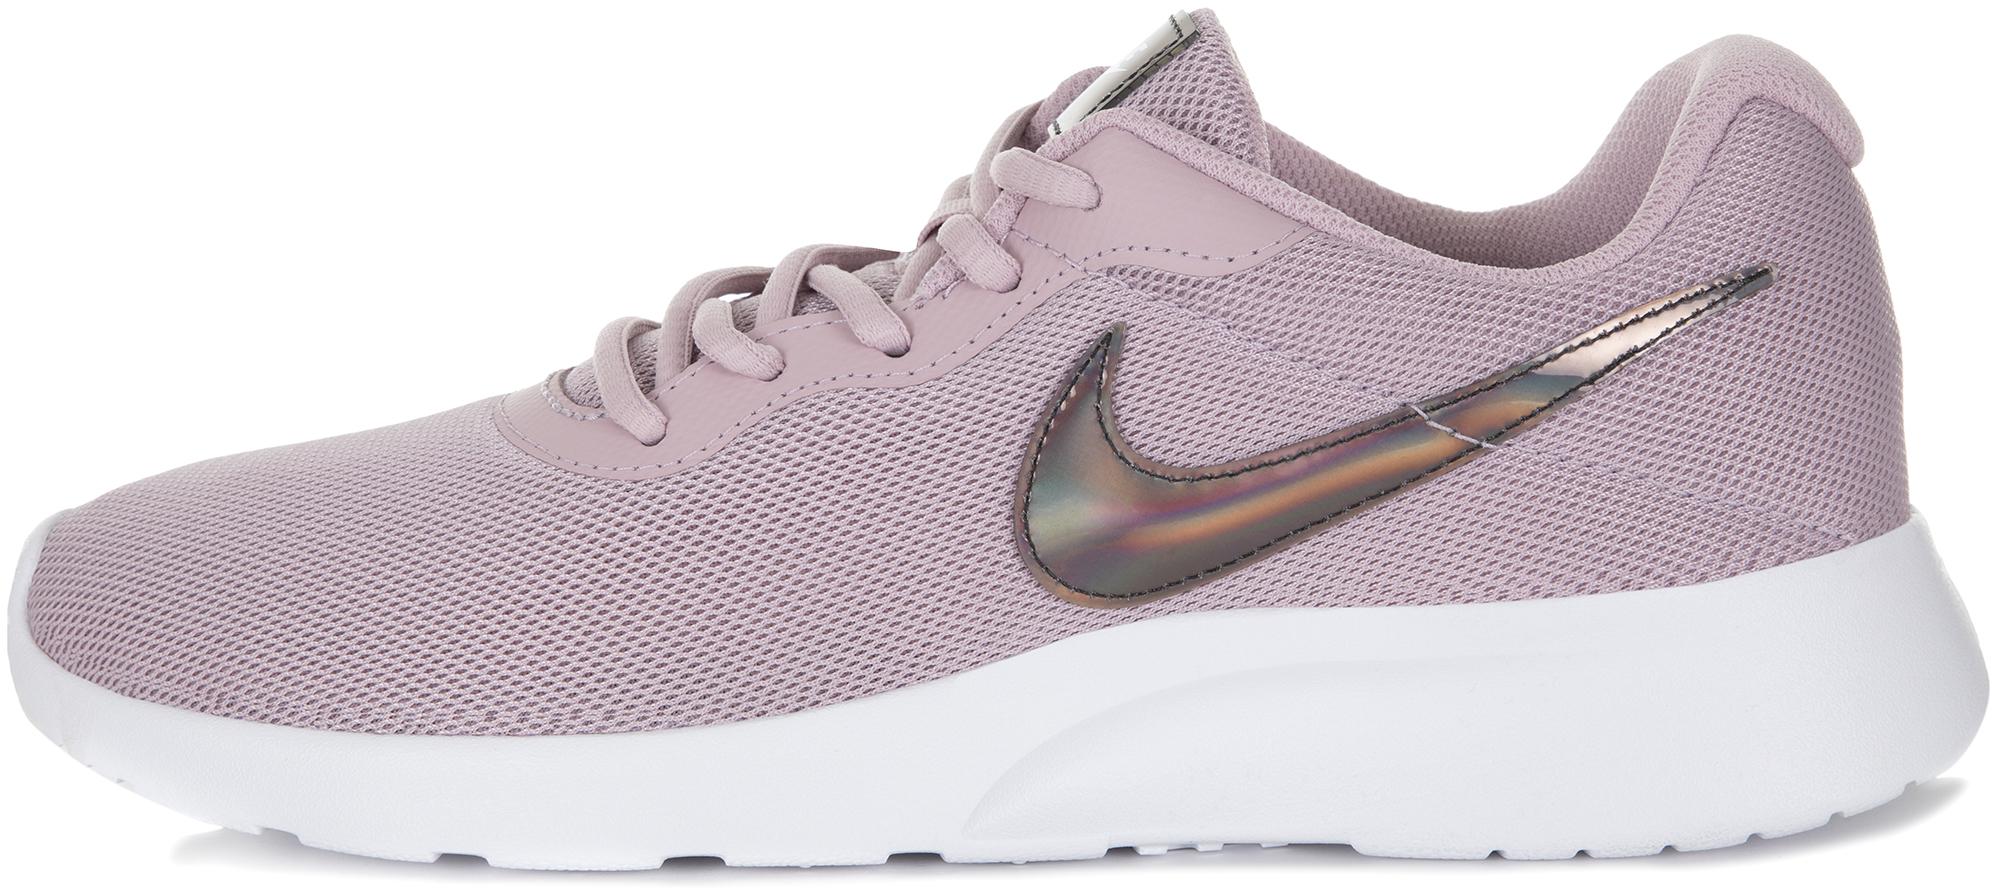 Nike Кроссовки женские Nike Tanjun, размер 38